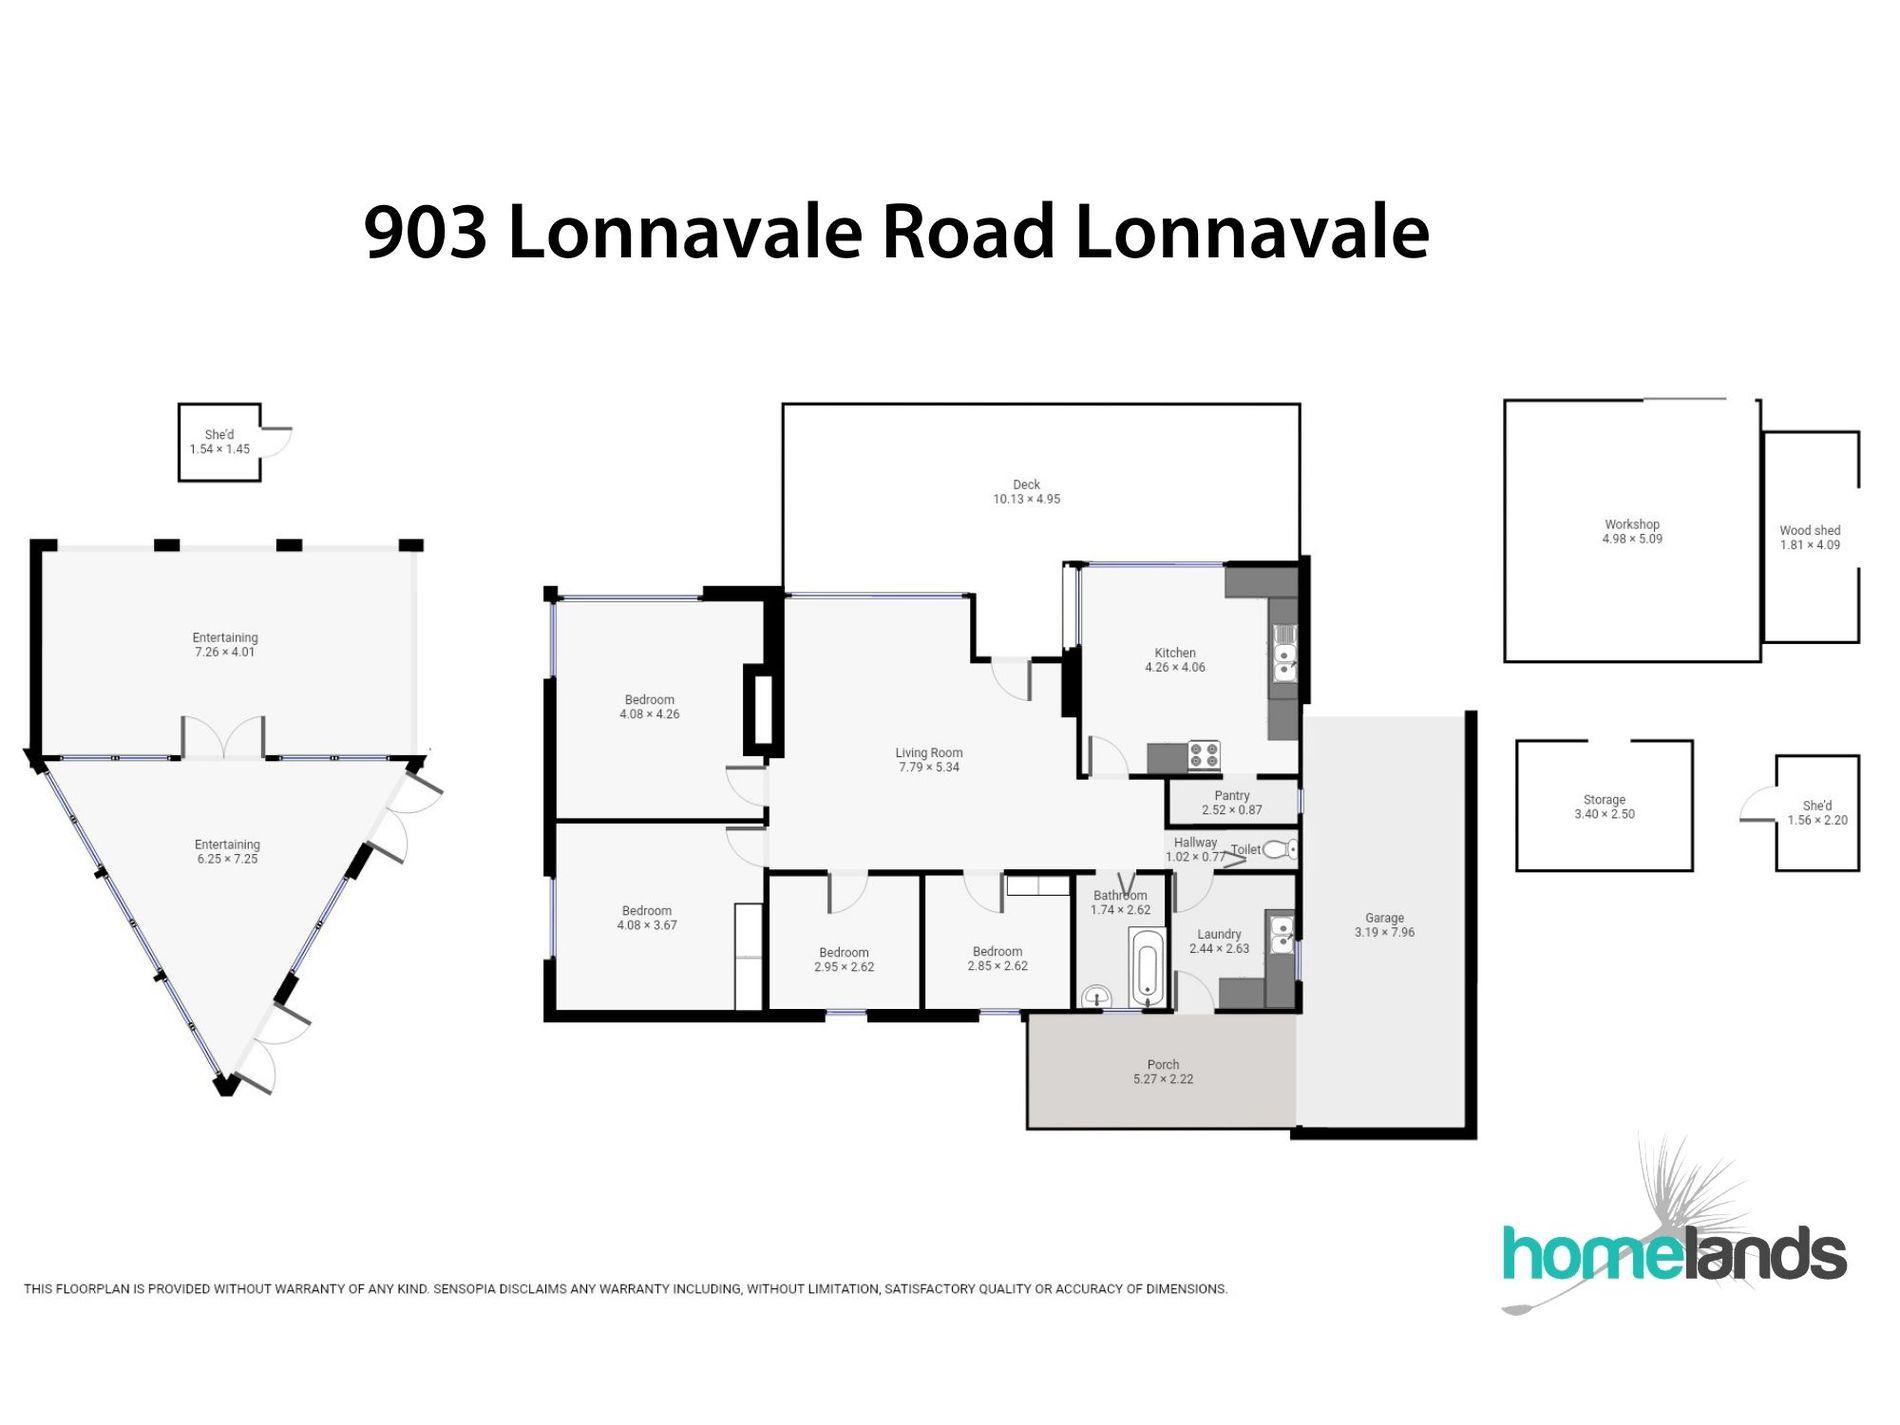 903 Lonnavale Road, Lonnavale